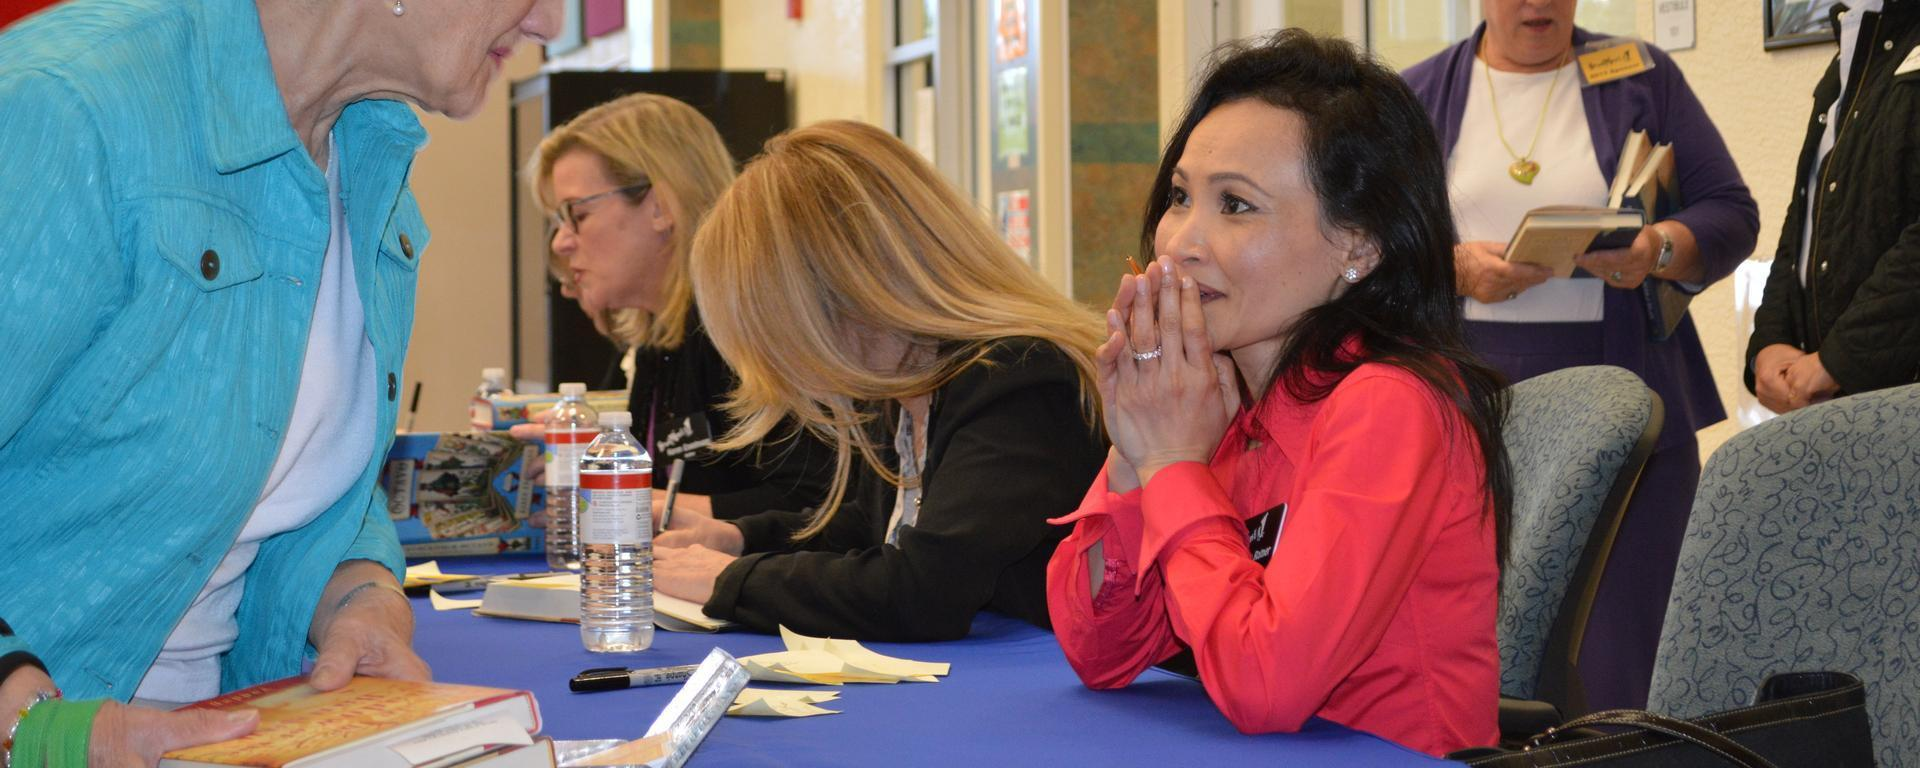 Authors signing books